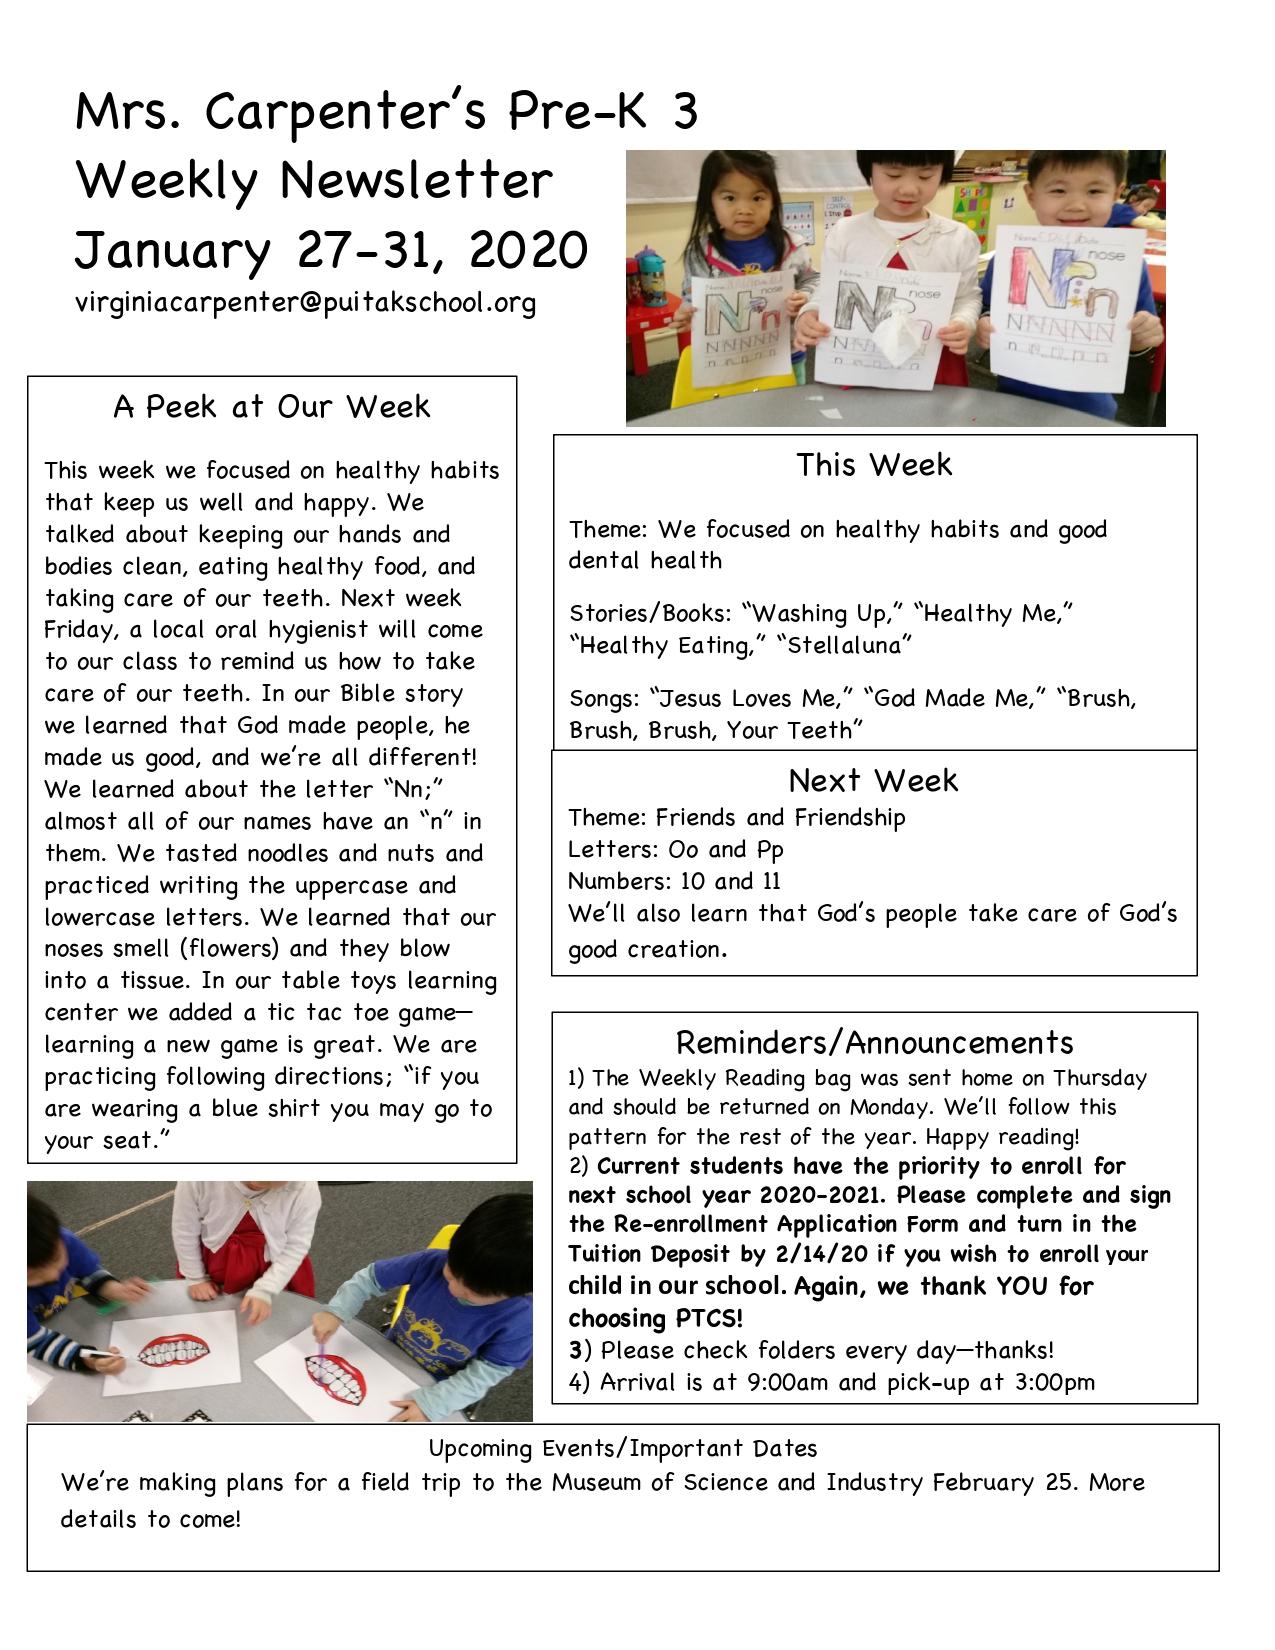 GinnyNewsletter2020January5thWeek_page-0